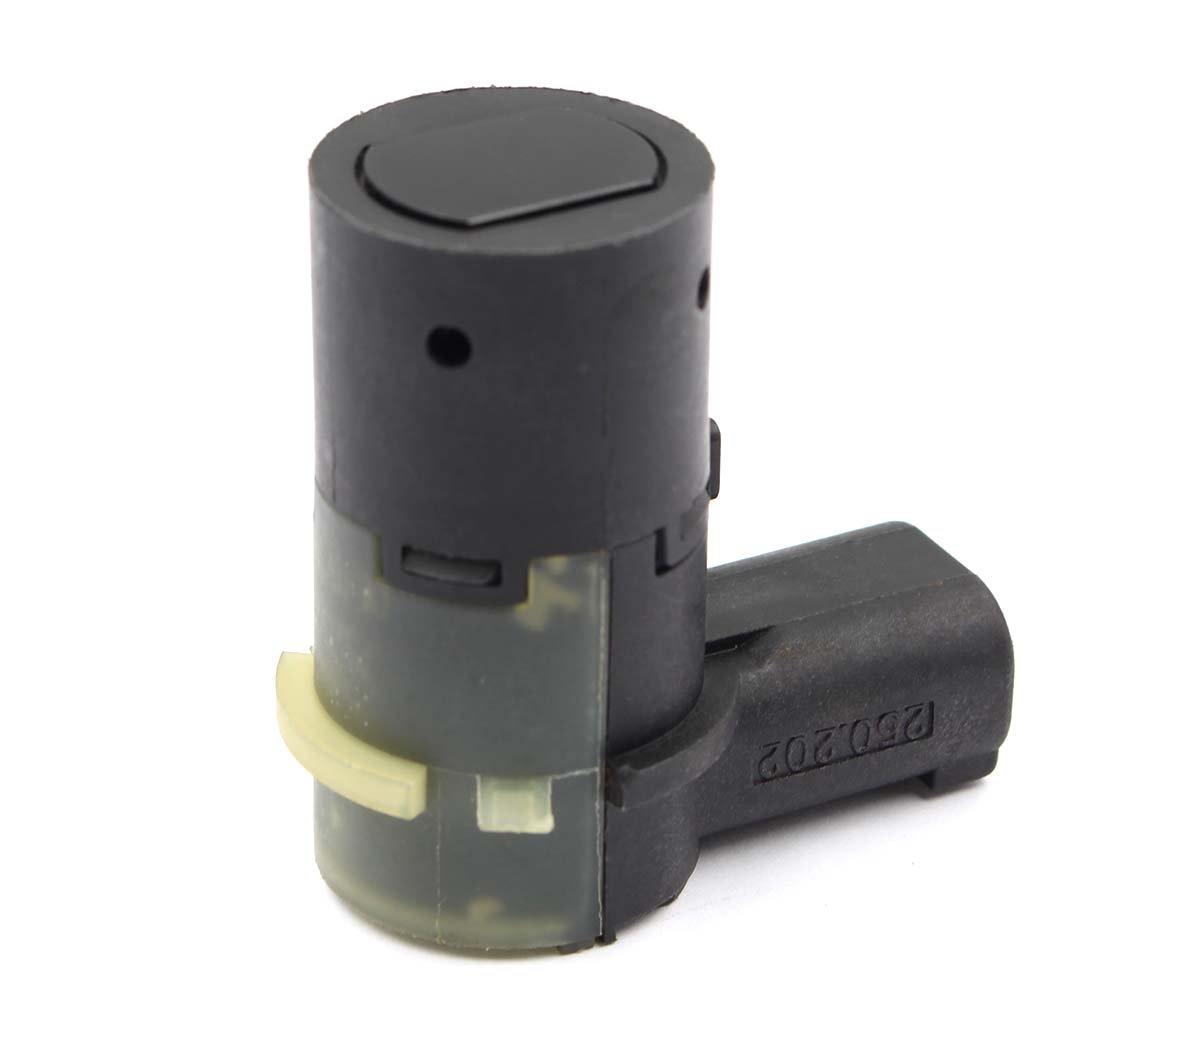 GooDeal Rear Parking Assist Sensor fit 03-04 Nissan Armada Nissan Titan 25994-7S200